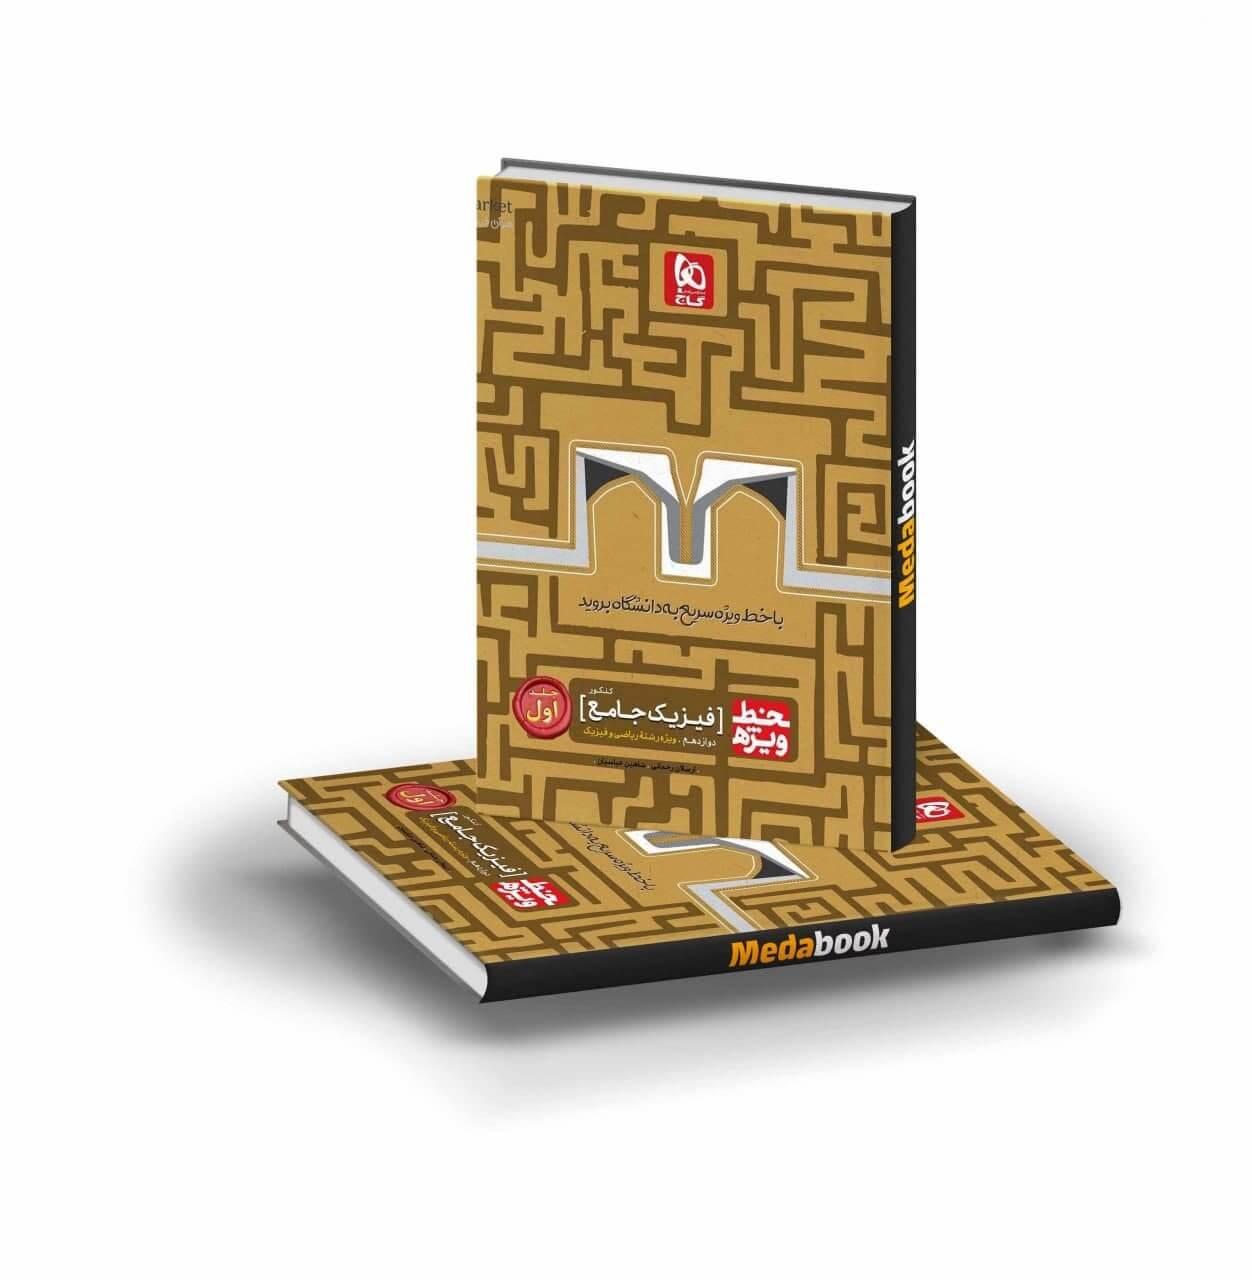 فیزیک جامع کنکور ریاضی خط ویژه گاج جلد 1